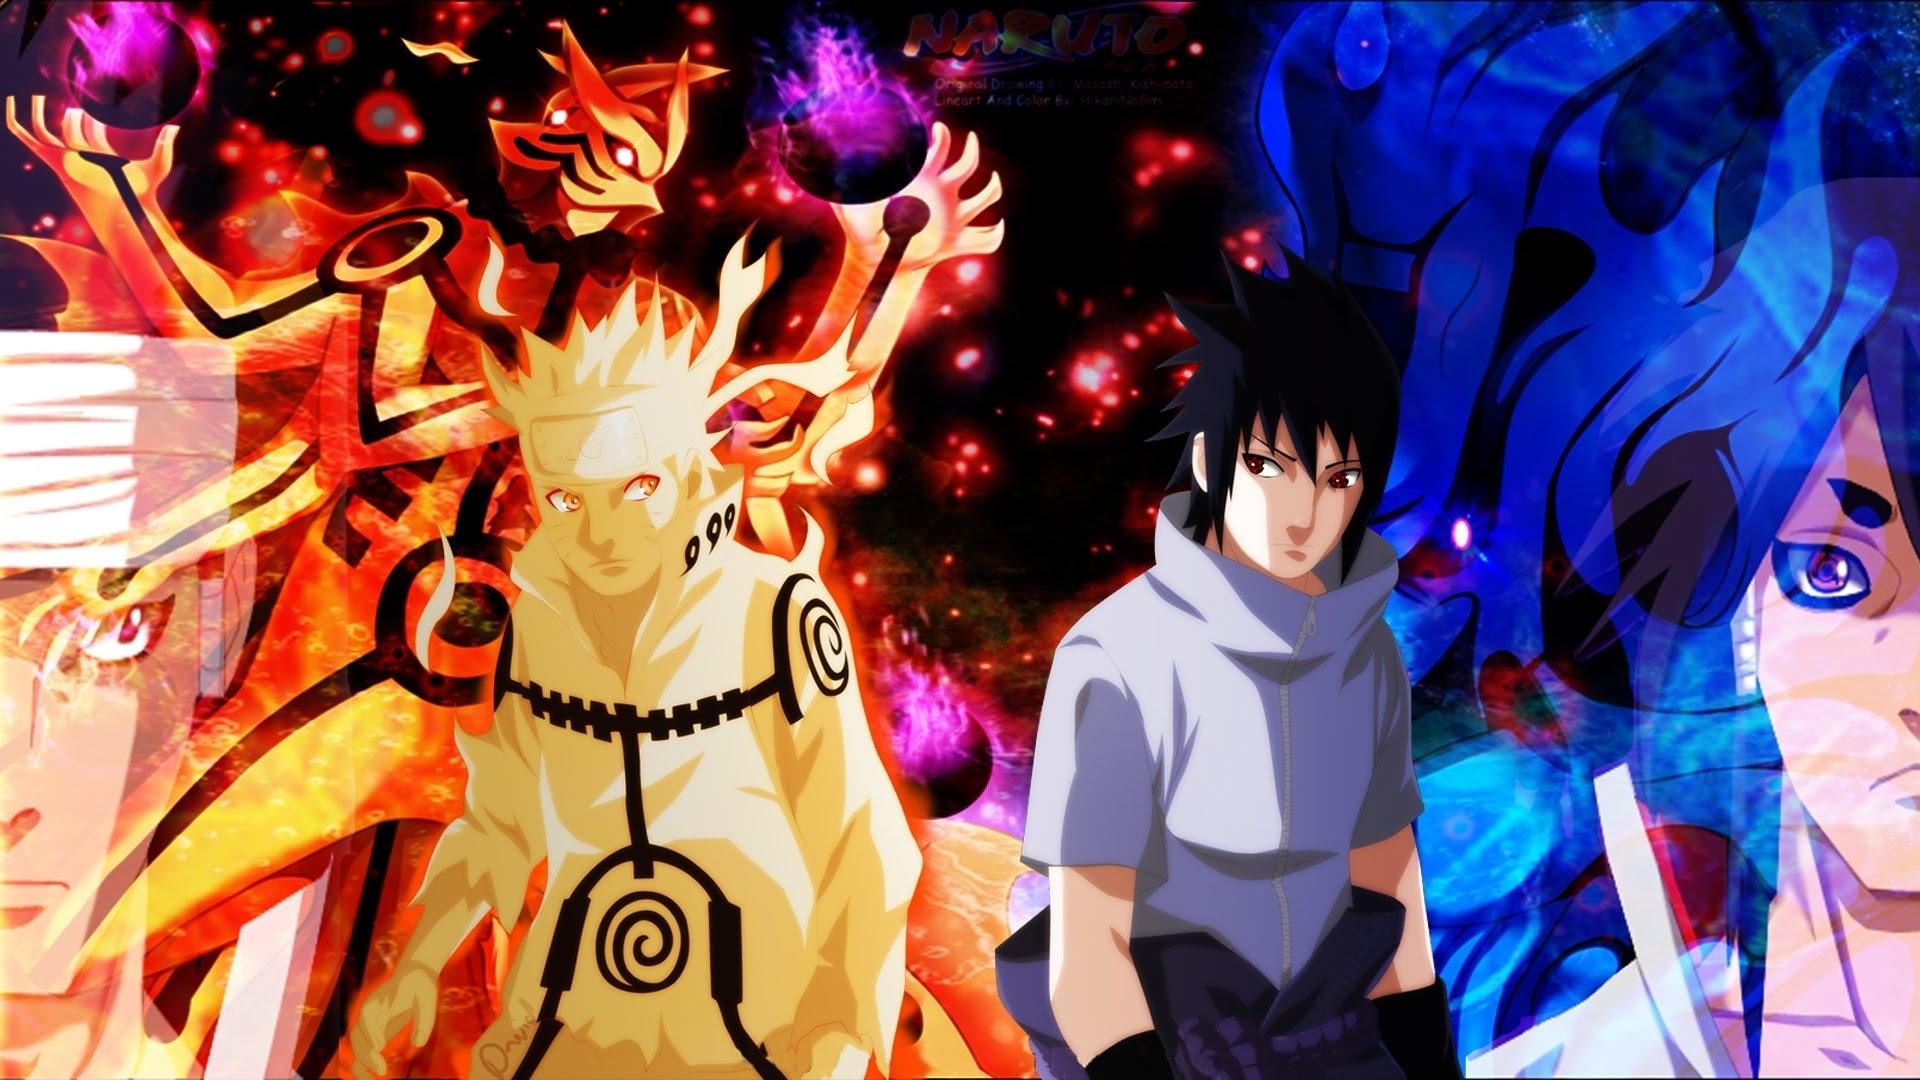 Battle Naruto Vs Sasuke Wallpaper Desktop Free Laptop